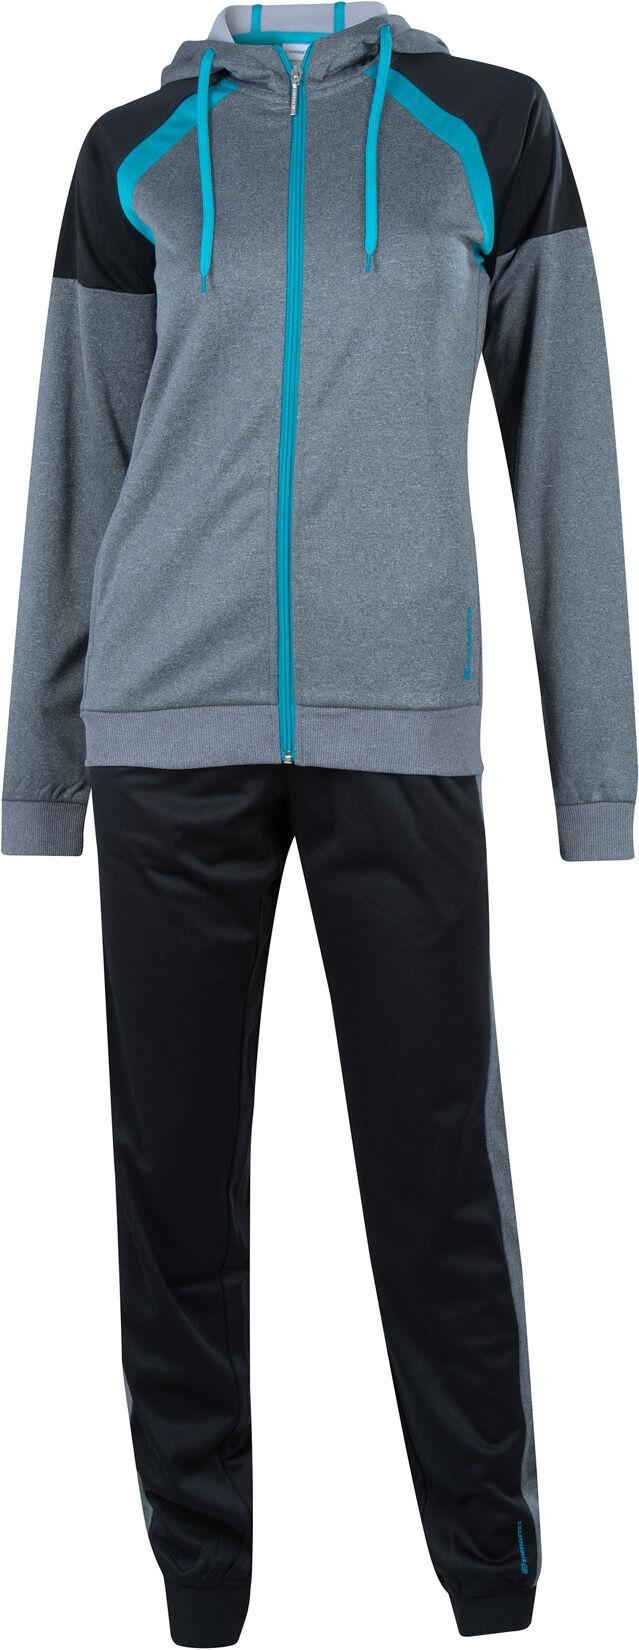 Orginal Adidas Trainingsanzug Gr. 176